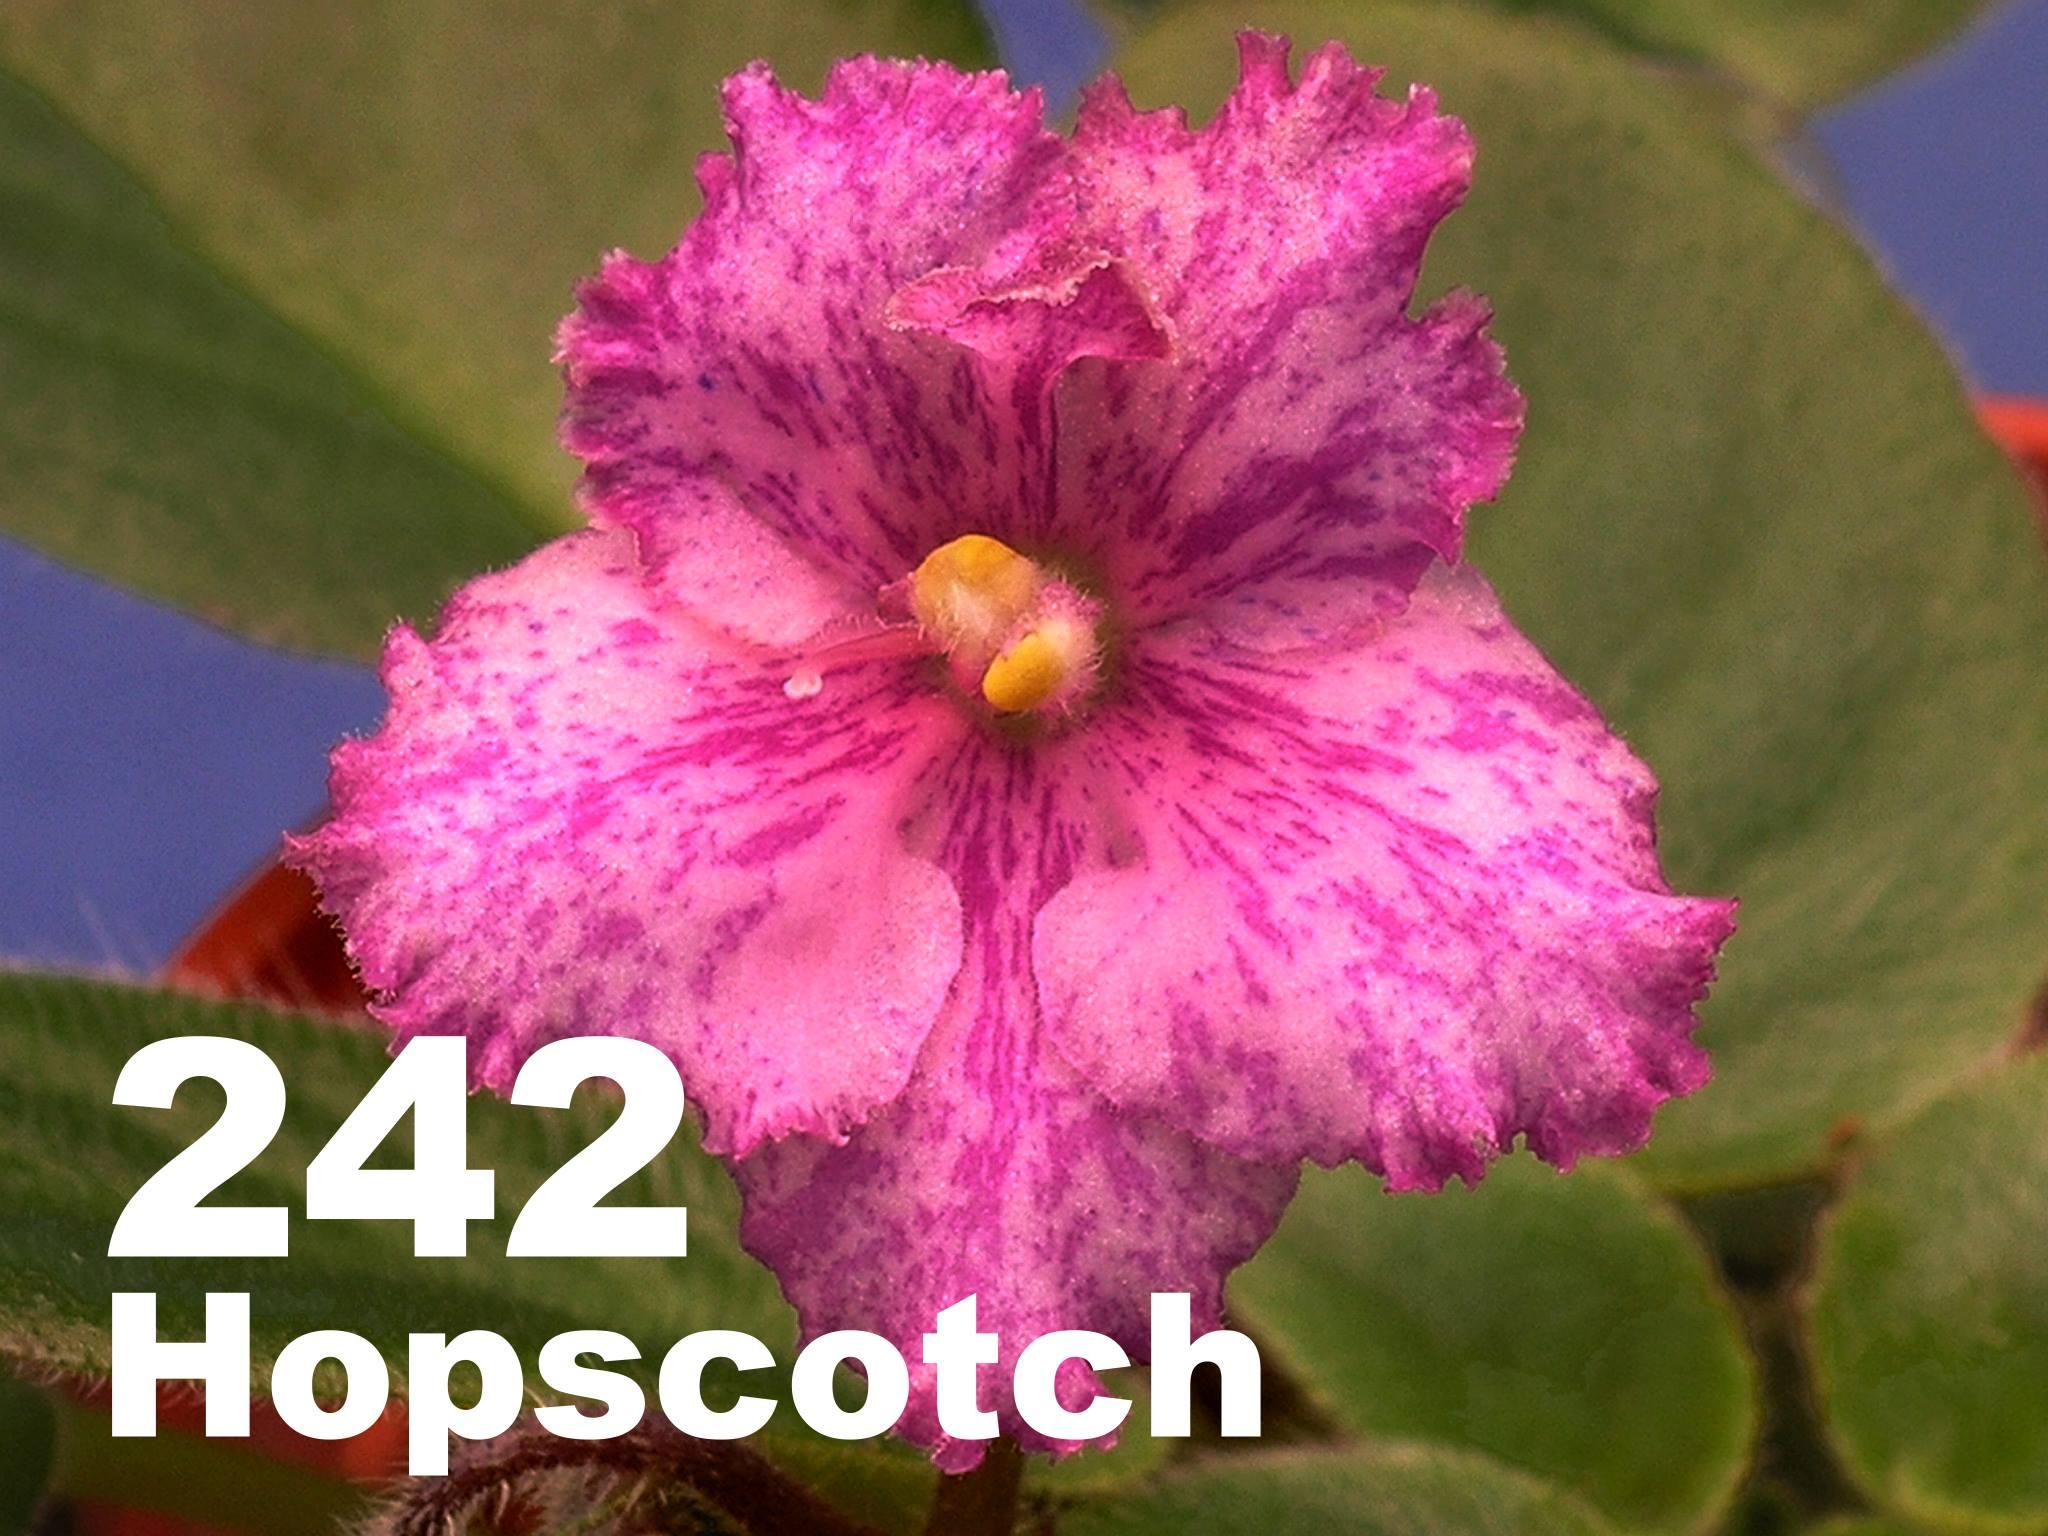 [242] Rob's Hopscotch 242